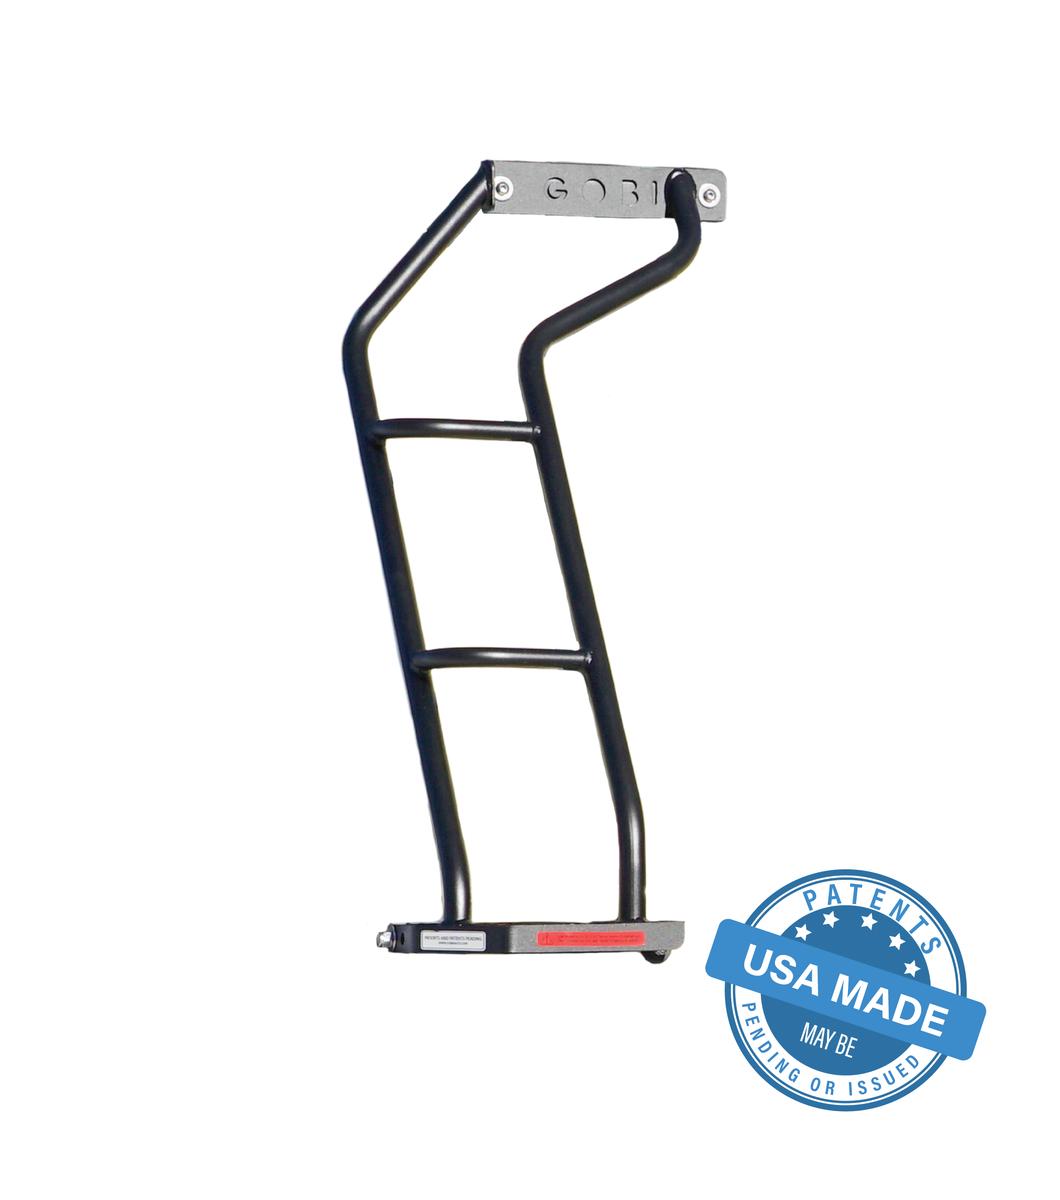 GOBI Jeep Wrangler JK-DV8 Ladder Driver Side